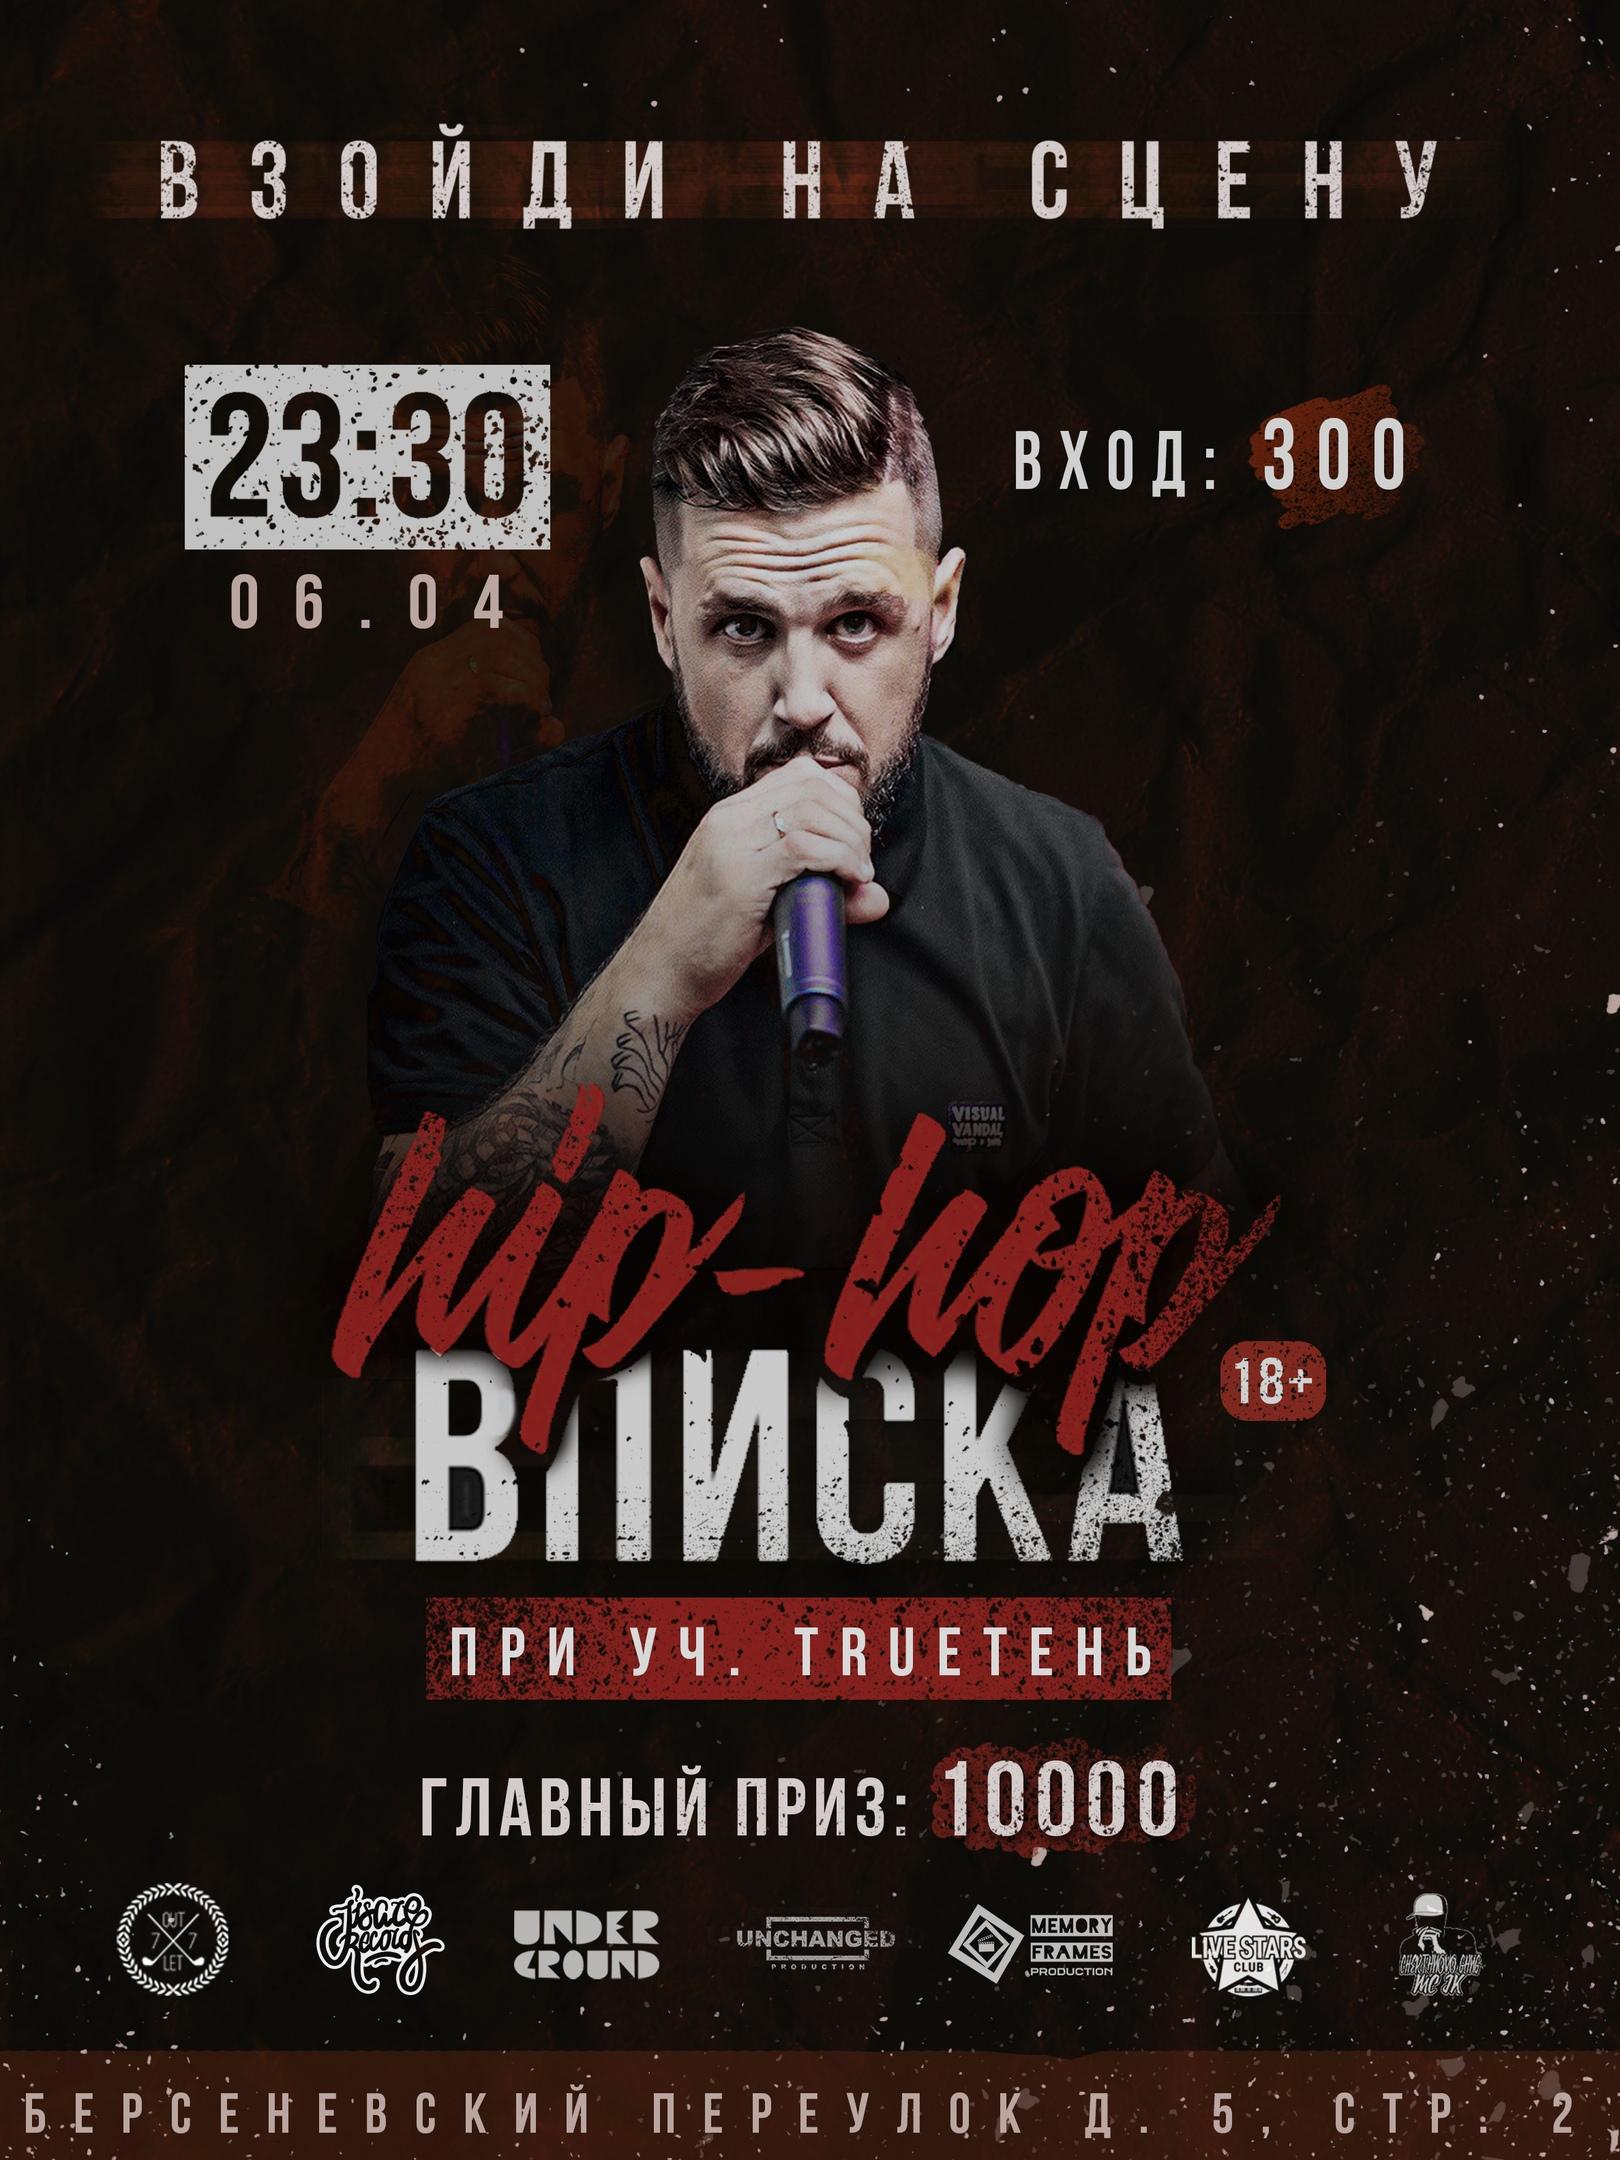 HIP-HOP ВПИСКА